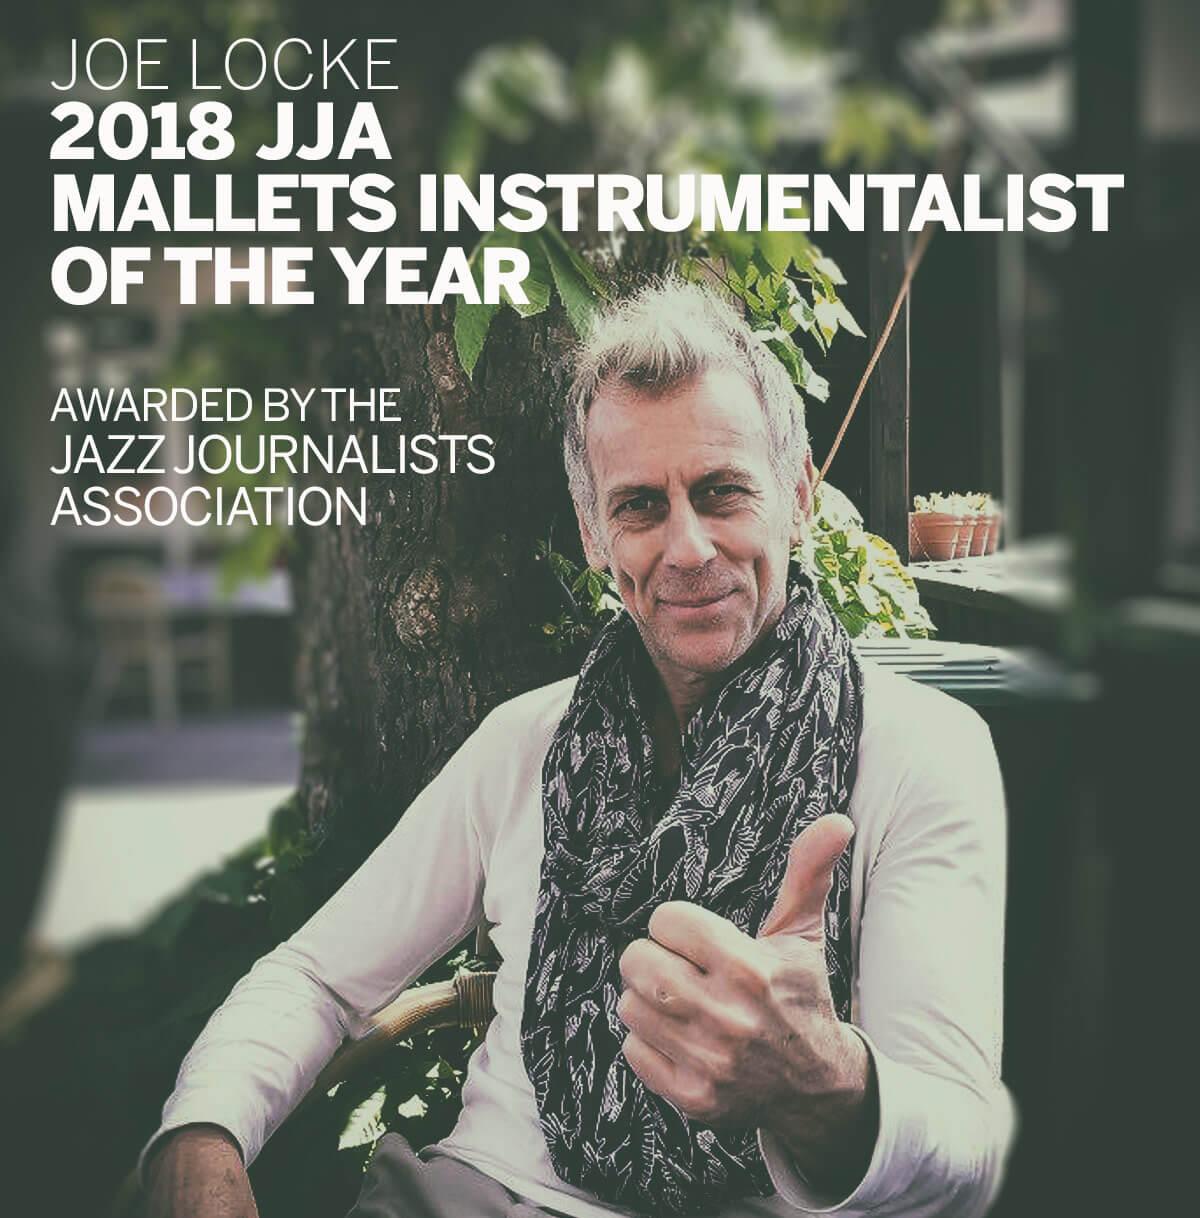 Joe Locke - 2018 JJA Award winner